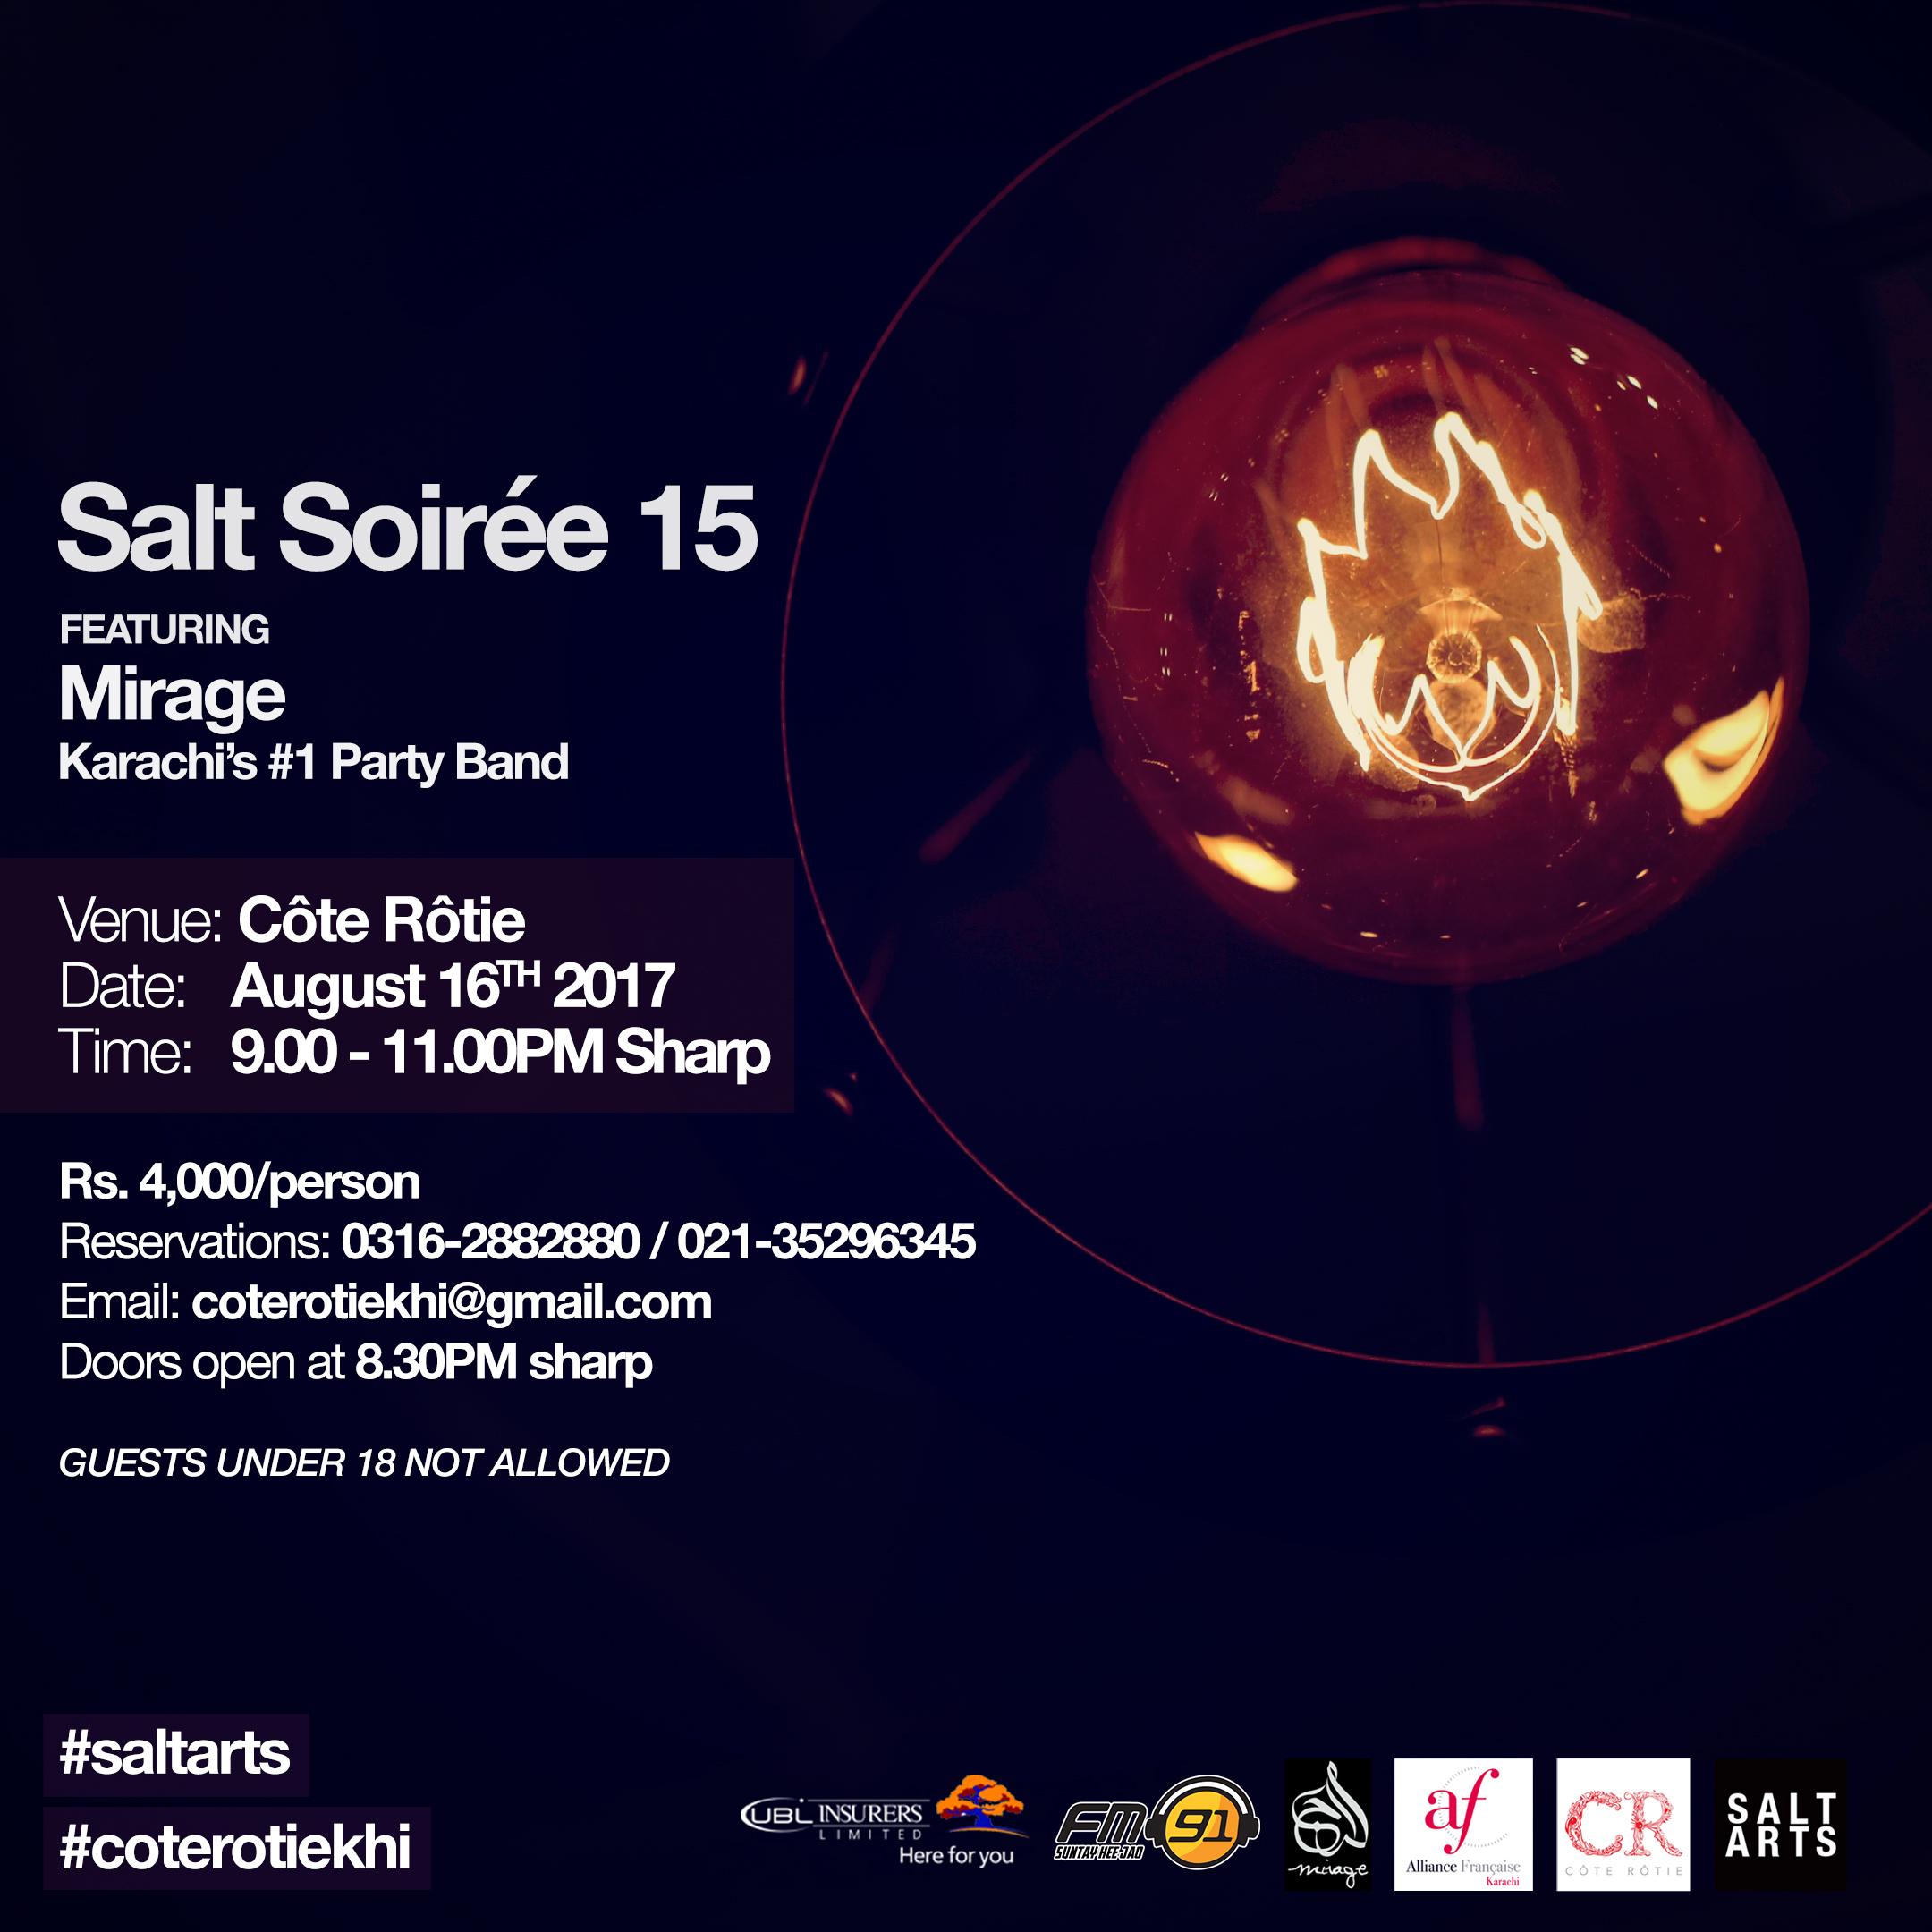 SS15 - Mirage.jpg